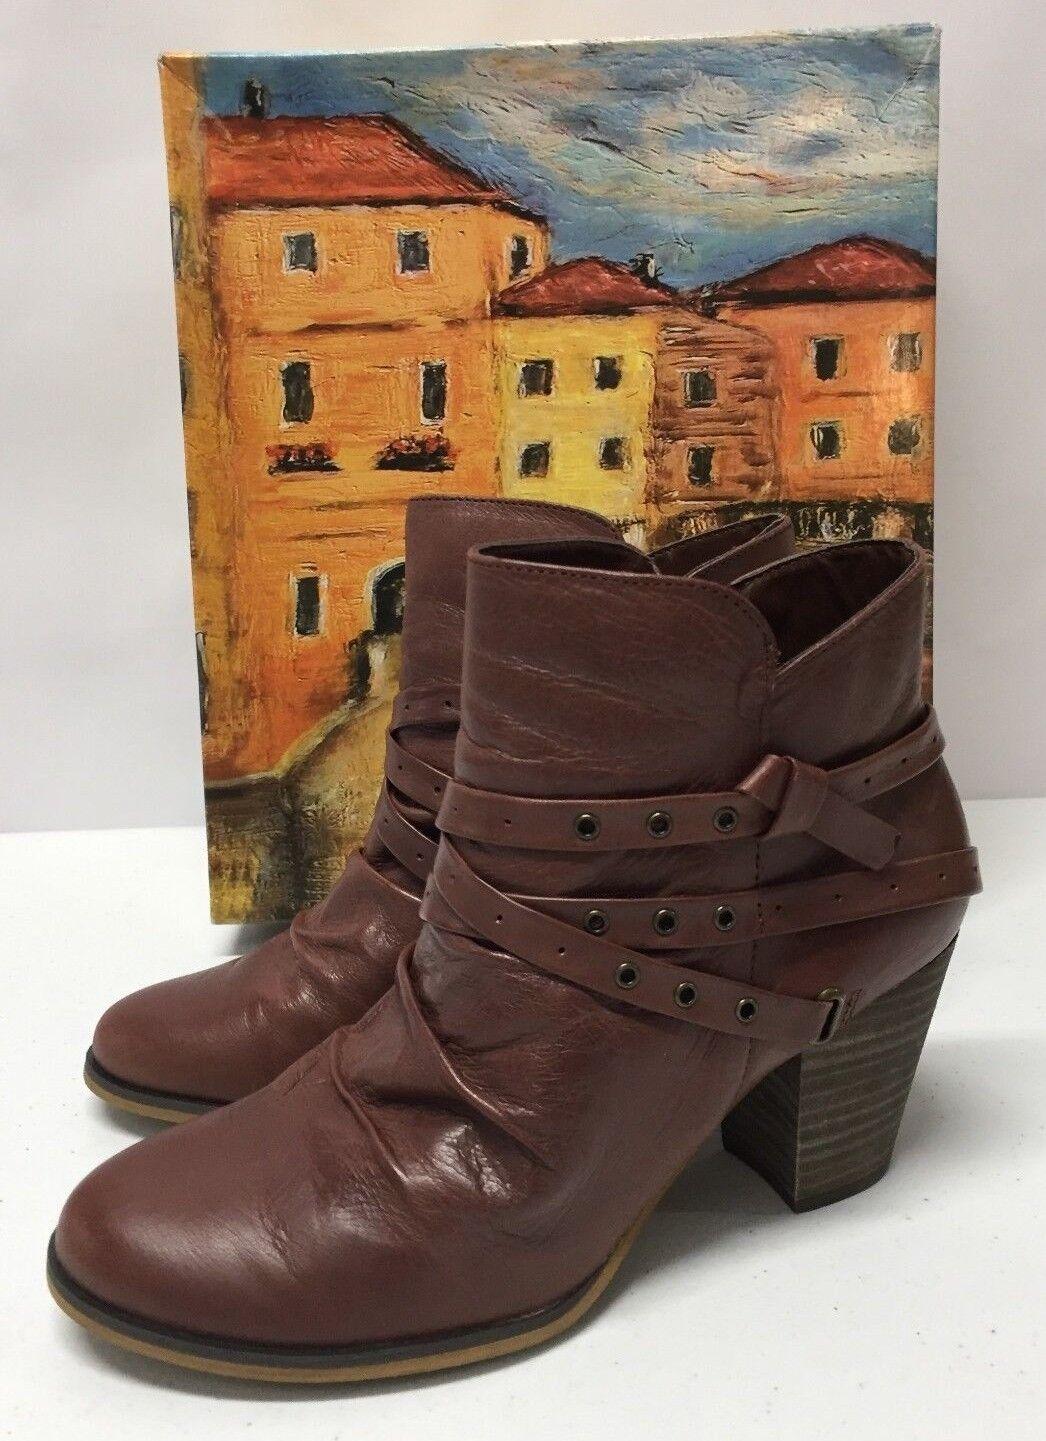 Bella-Vita Womens Dark Tan Kiki Ankle Boots Shoe Size 8 M